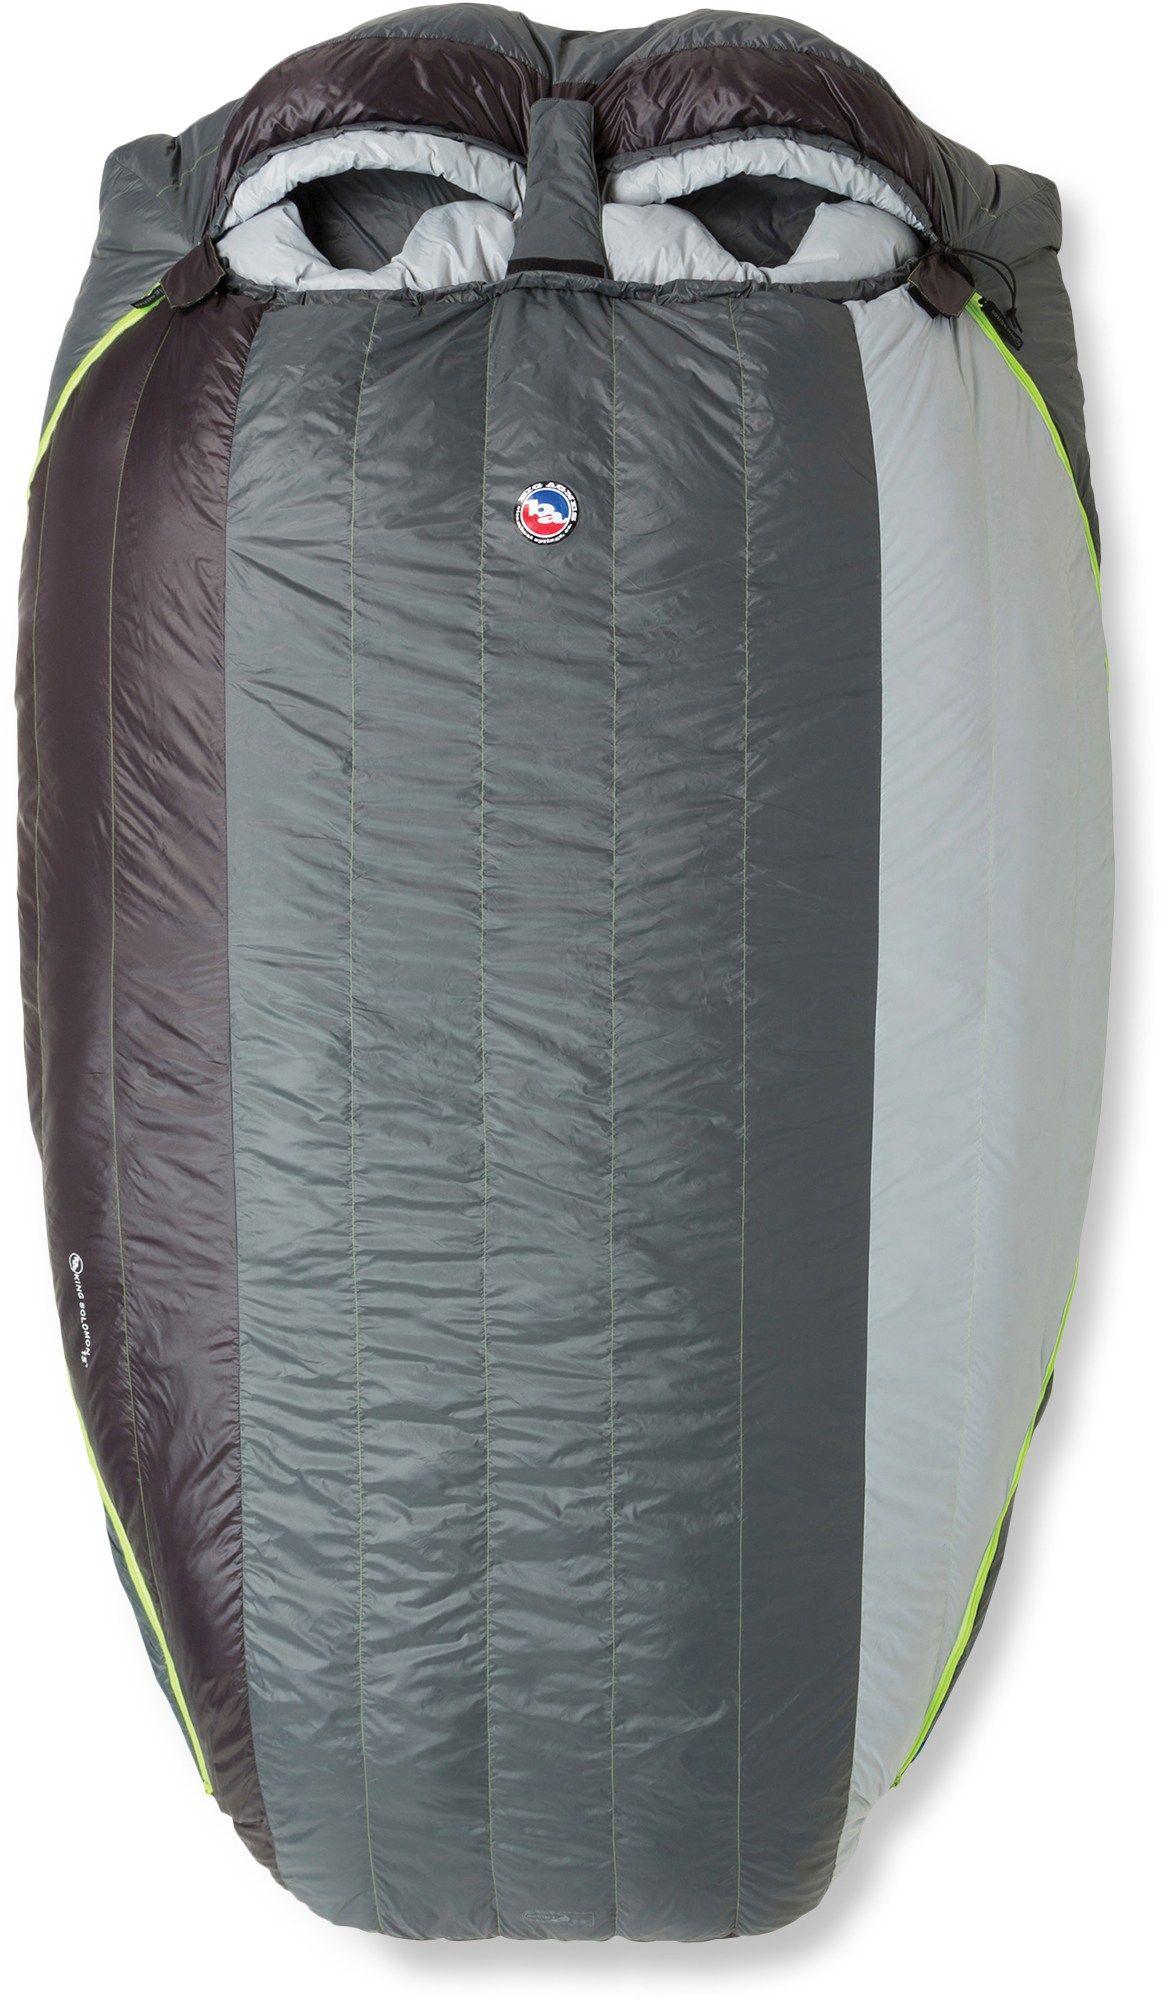 Big agnes unisex king solomon sleeping bag double camping